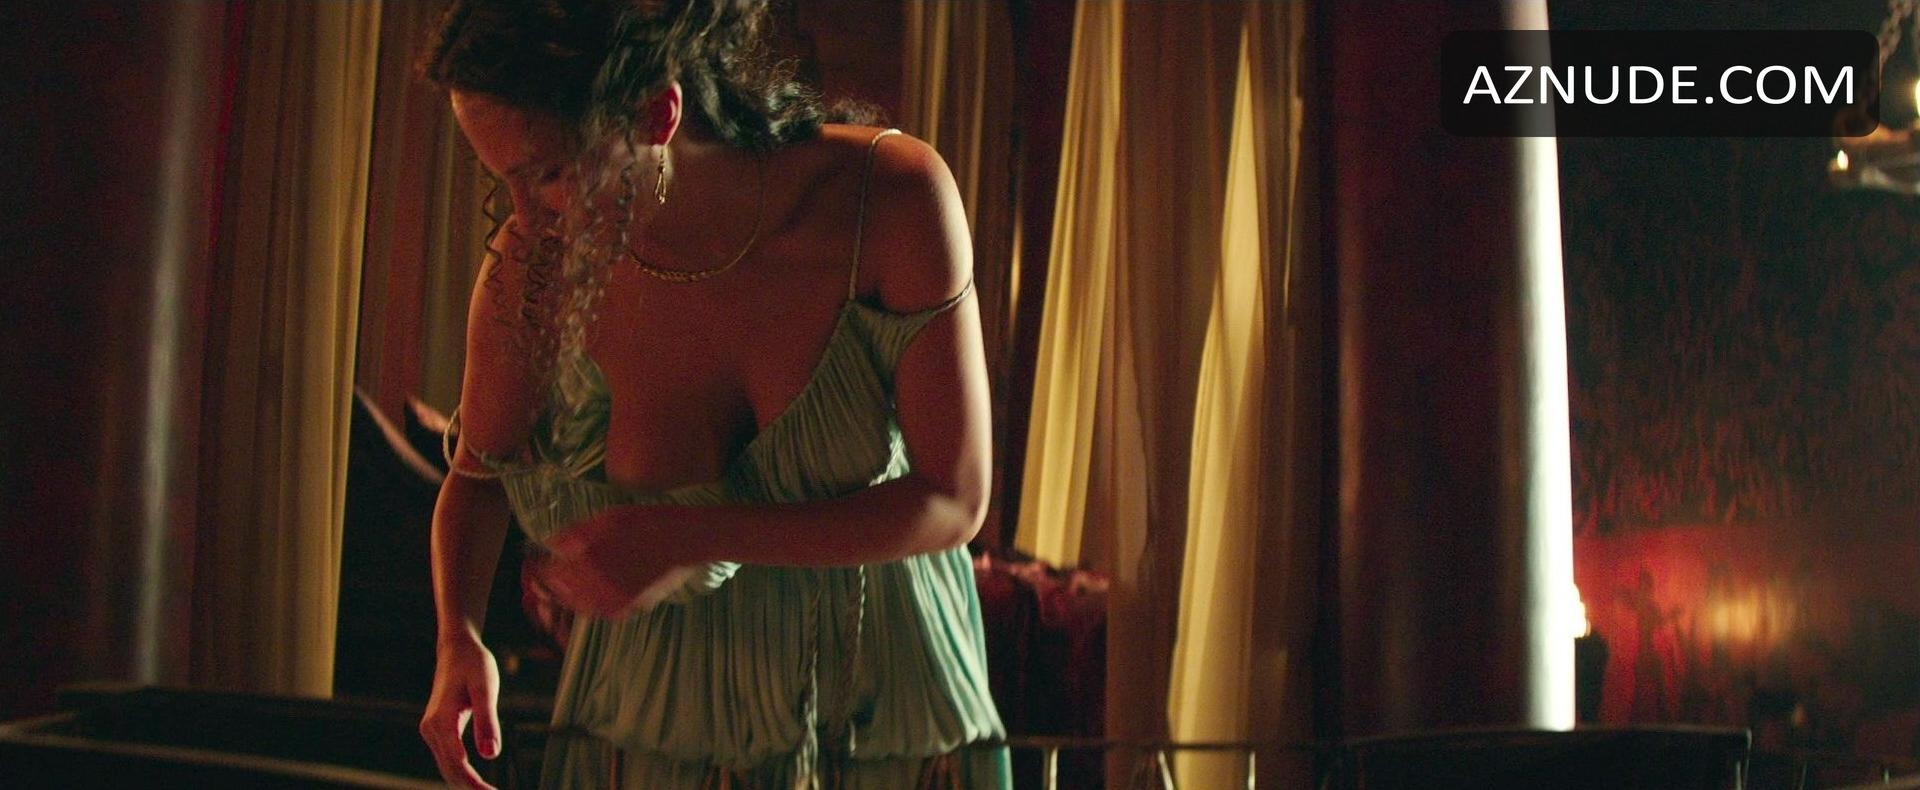 Ruby modine nude sex scene in memoria scandalplanetcom - 5 7